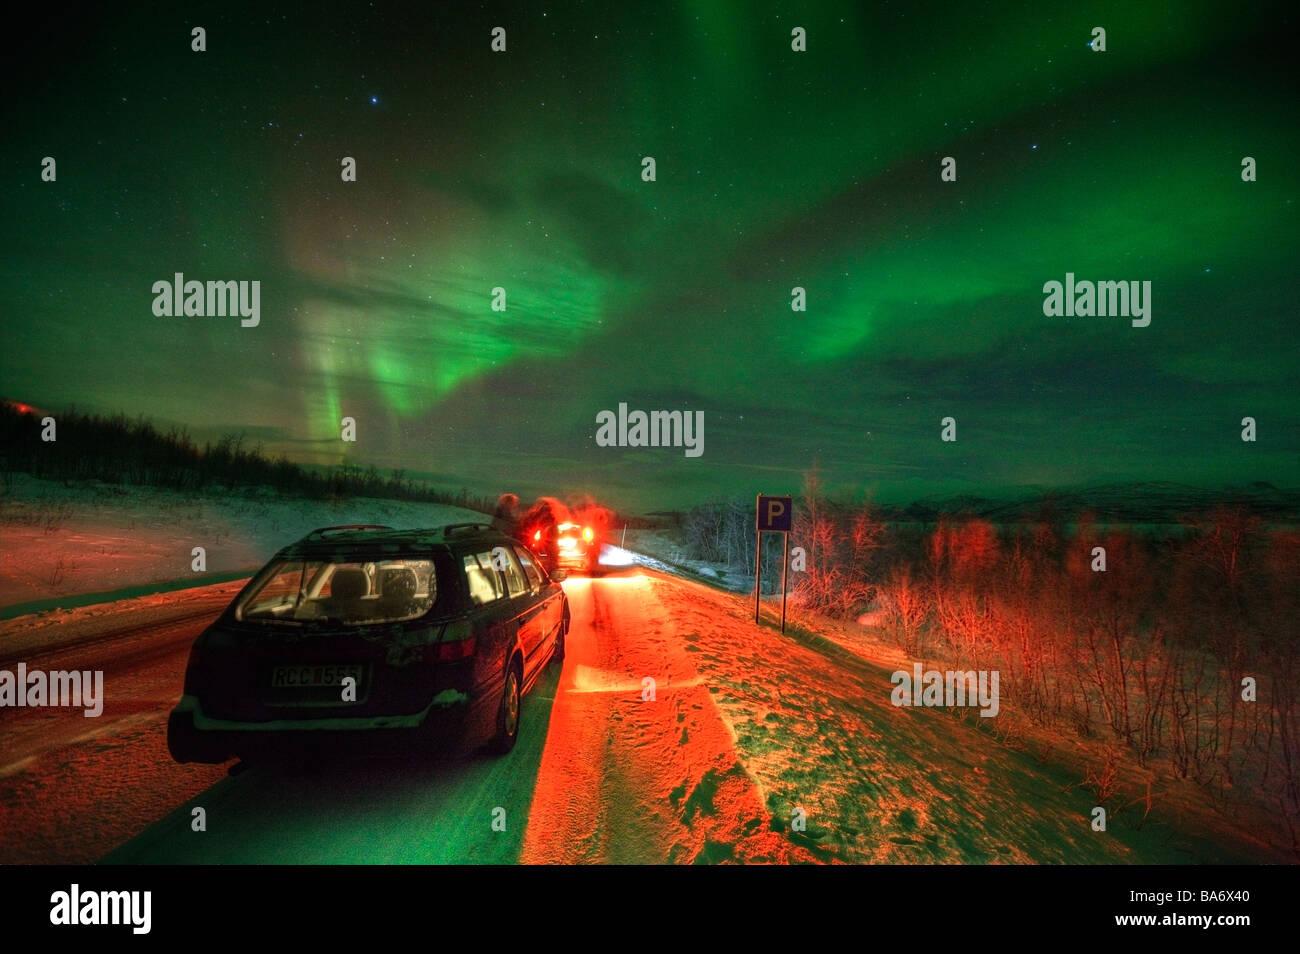 Aurora Borealis or Northern Lights, Lapland Sweden - Stock Image